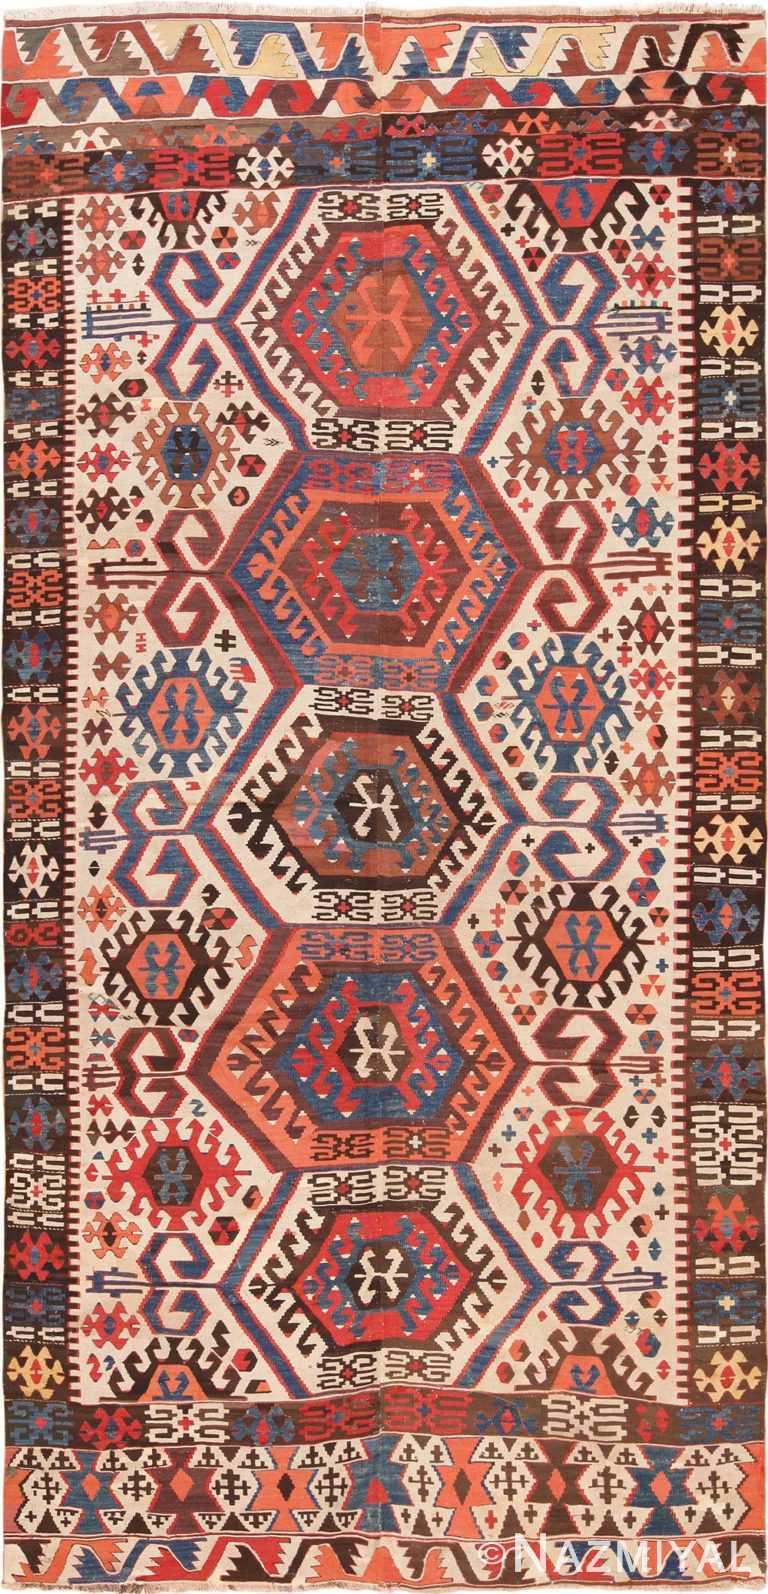 Full view Antique Turkish Konya Kilim Rug 70121 by Nazmiyal